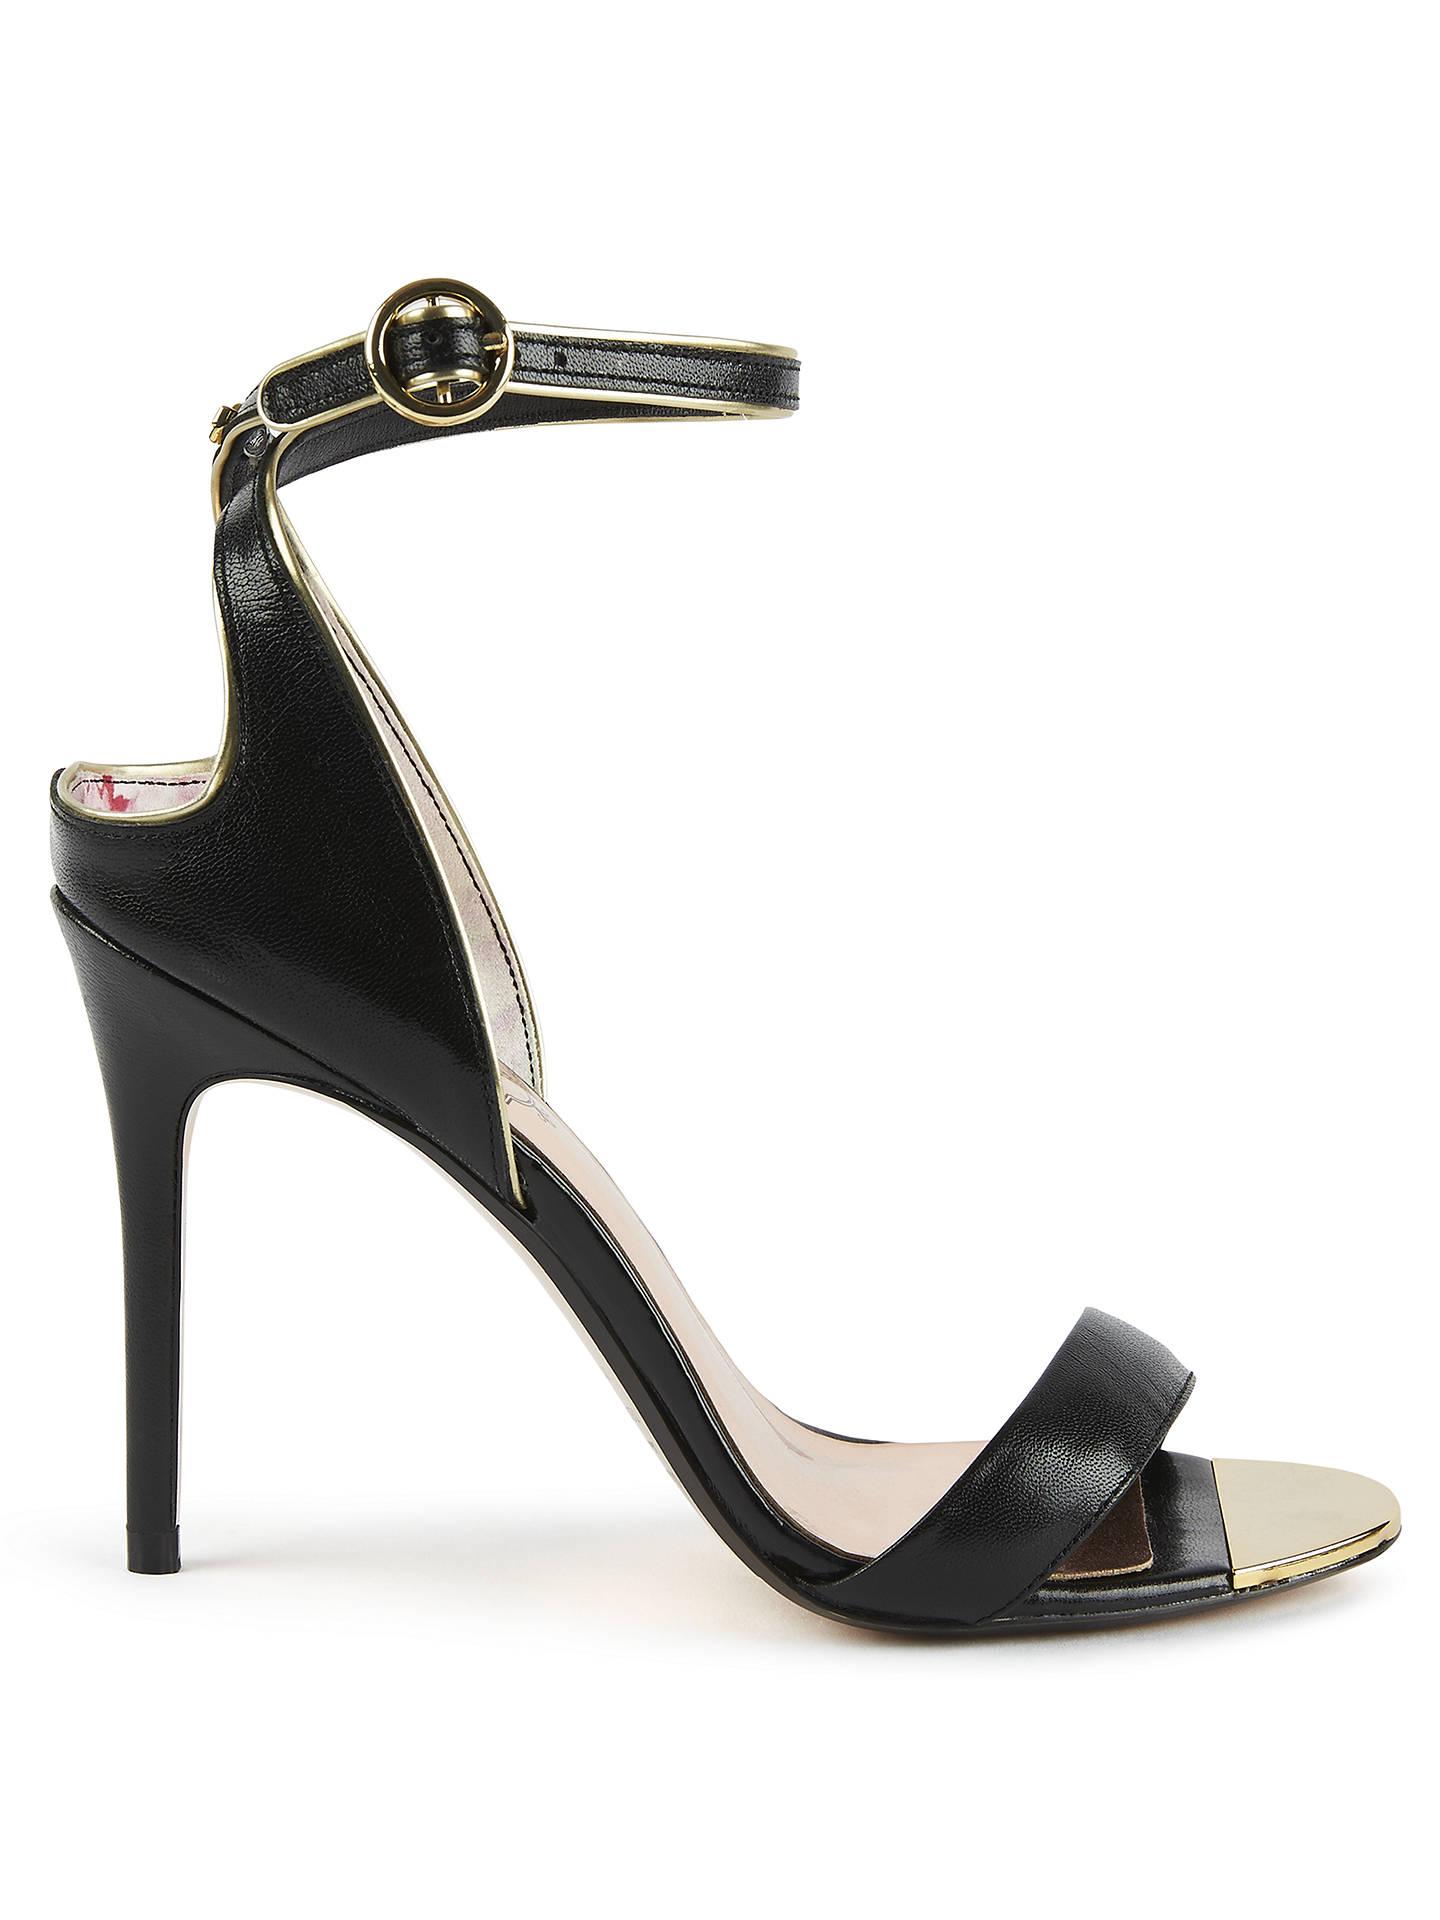 53bc70d9d ... Buy Ted Baker Mirobell Stiletto Heeled Sandals